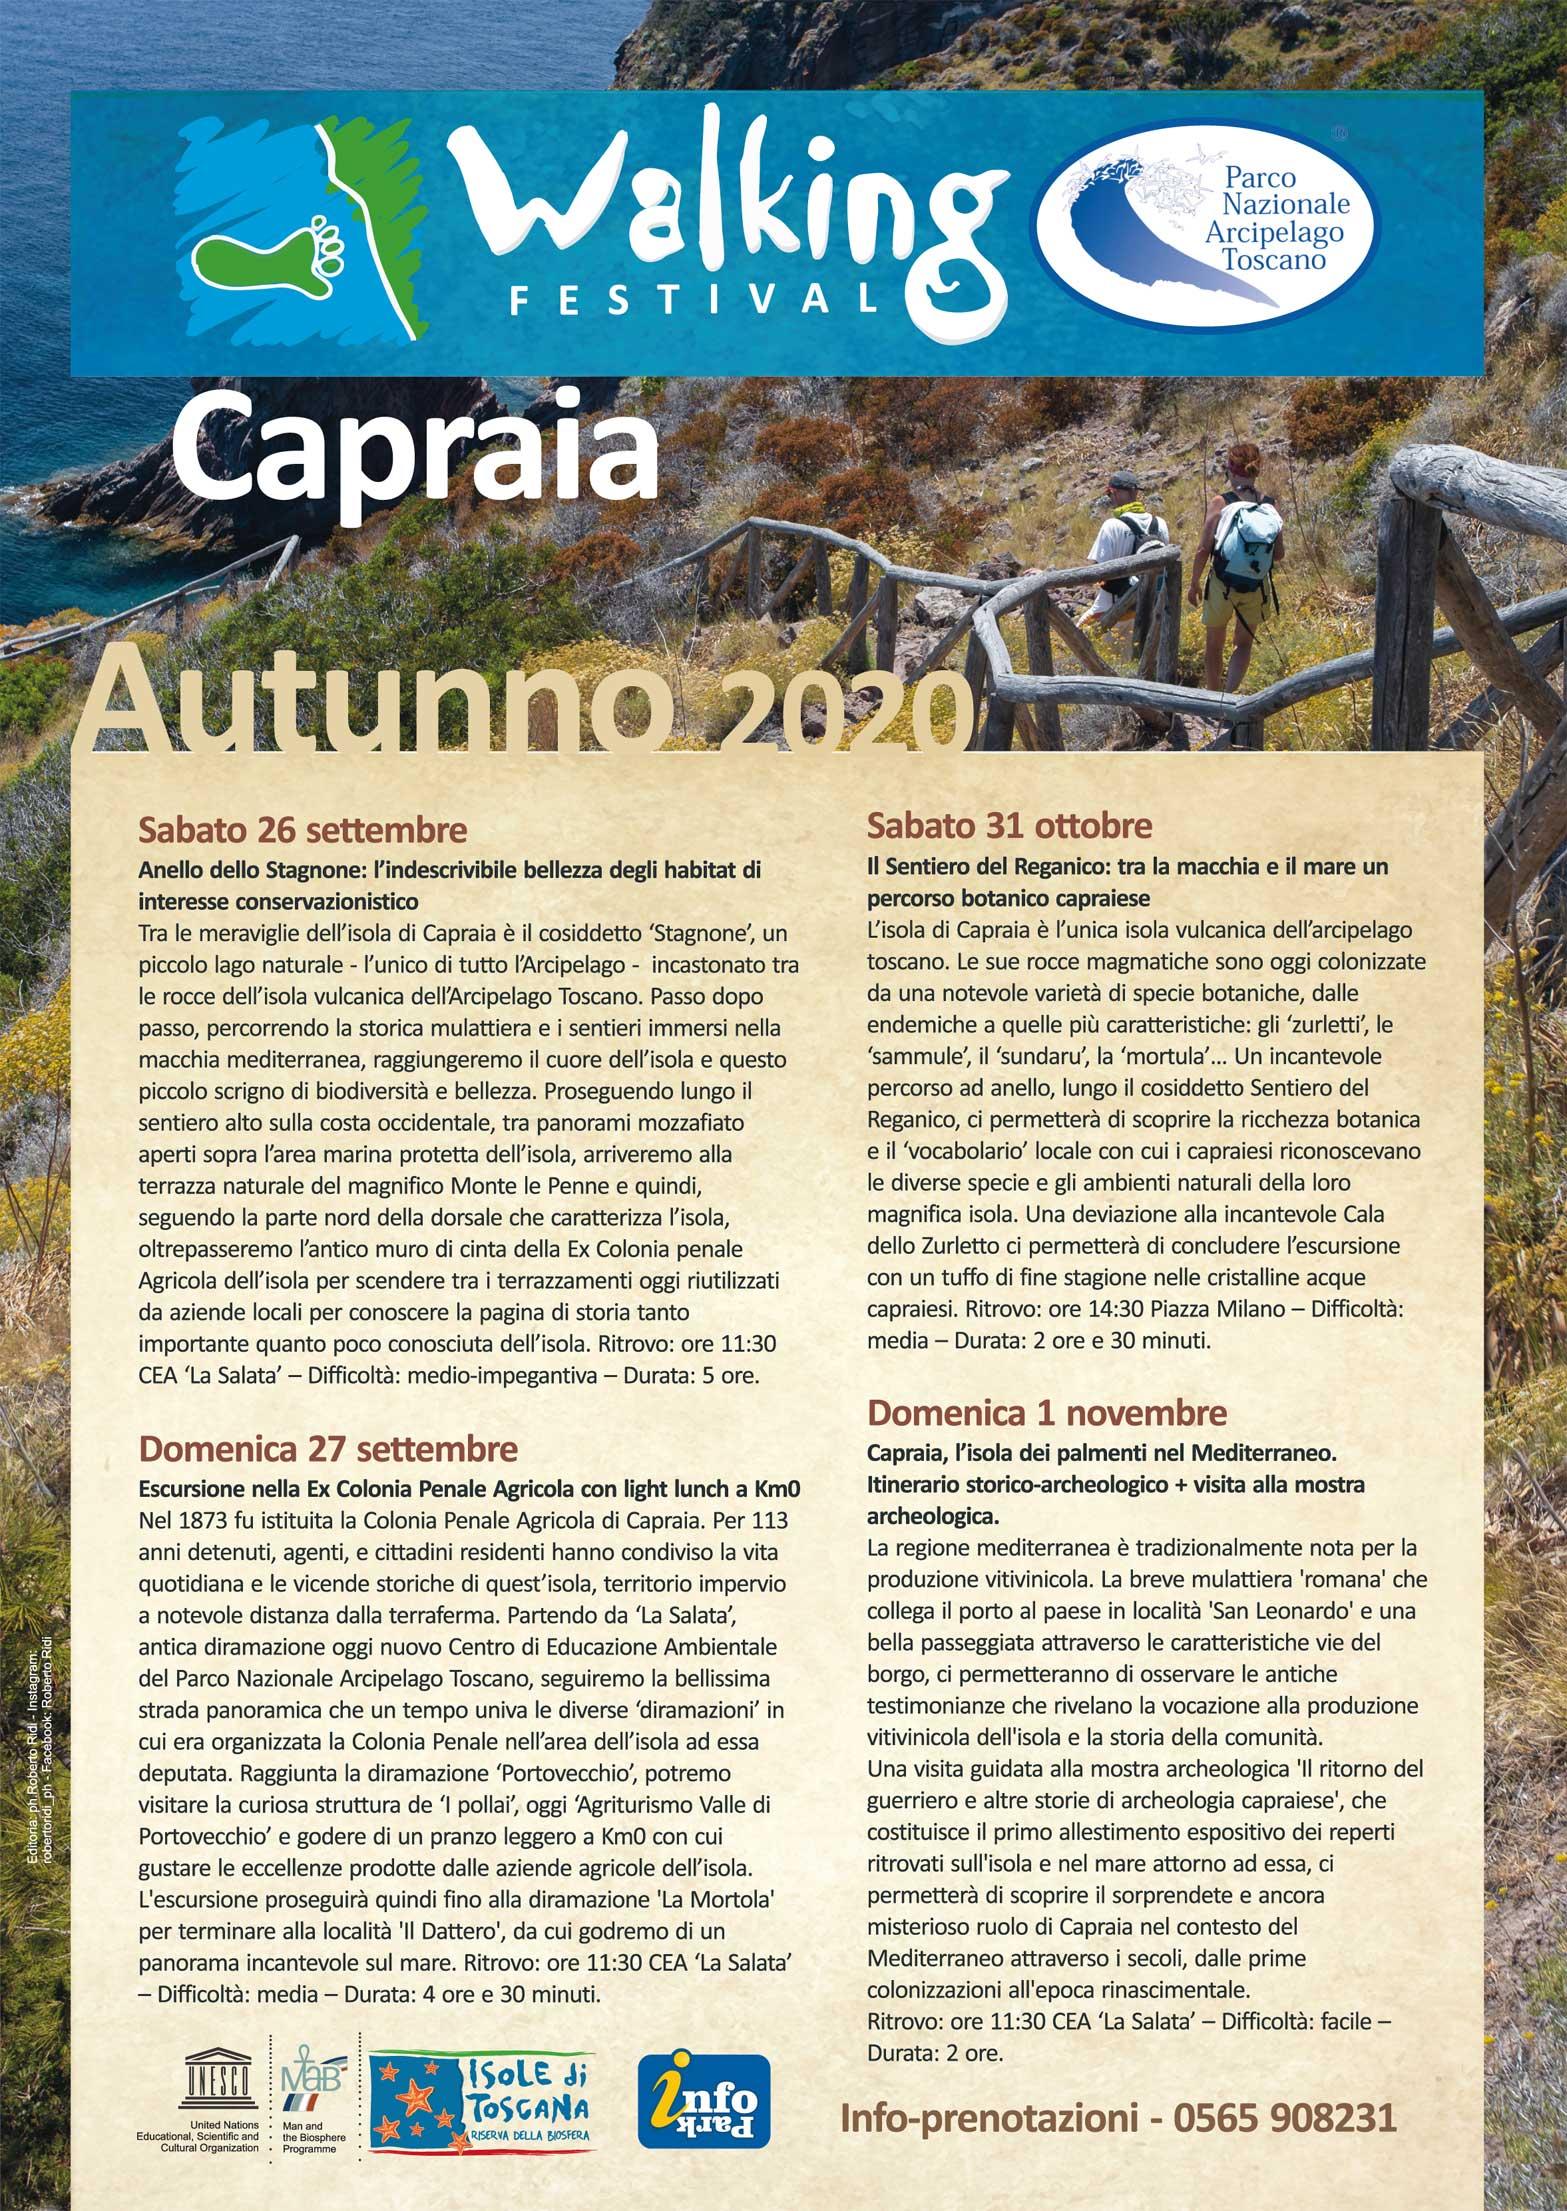 Walking Festival Capraia